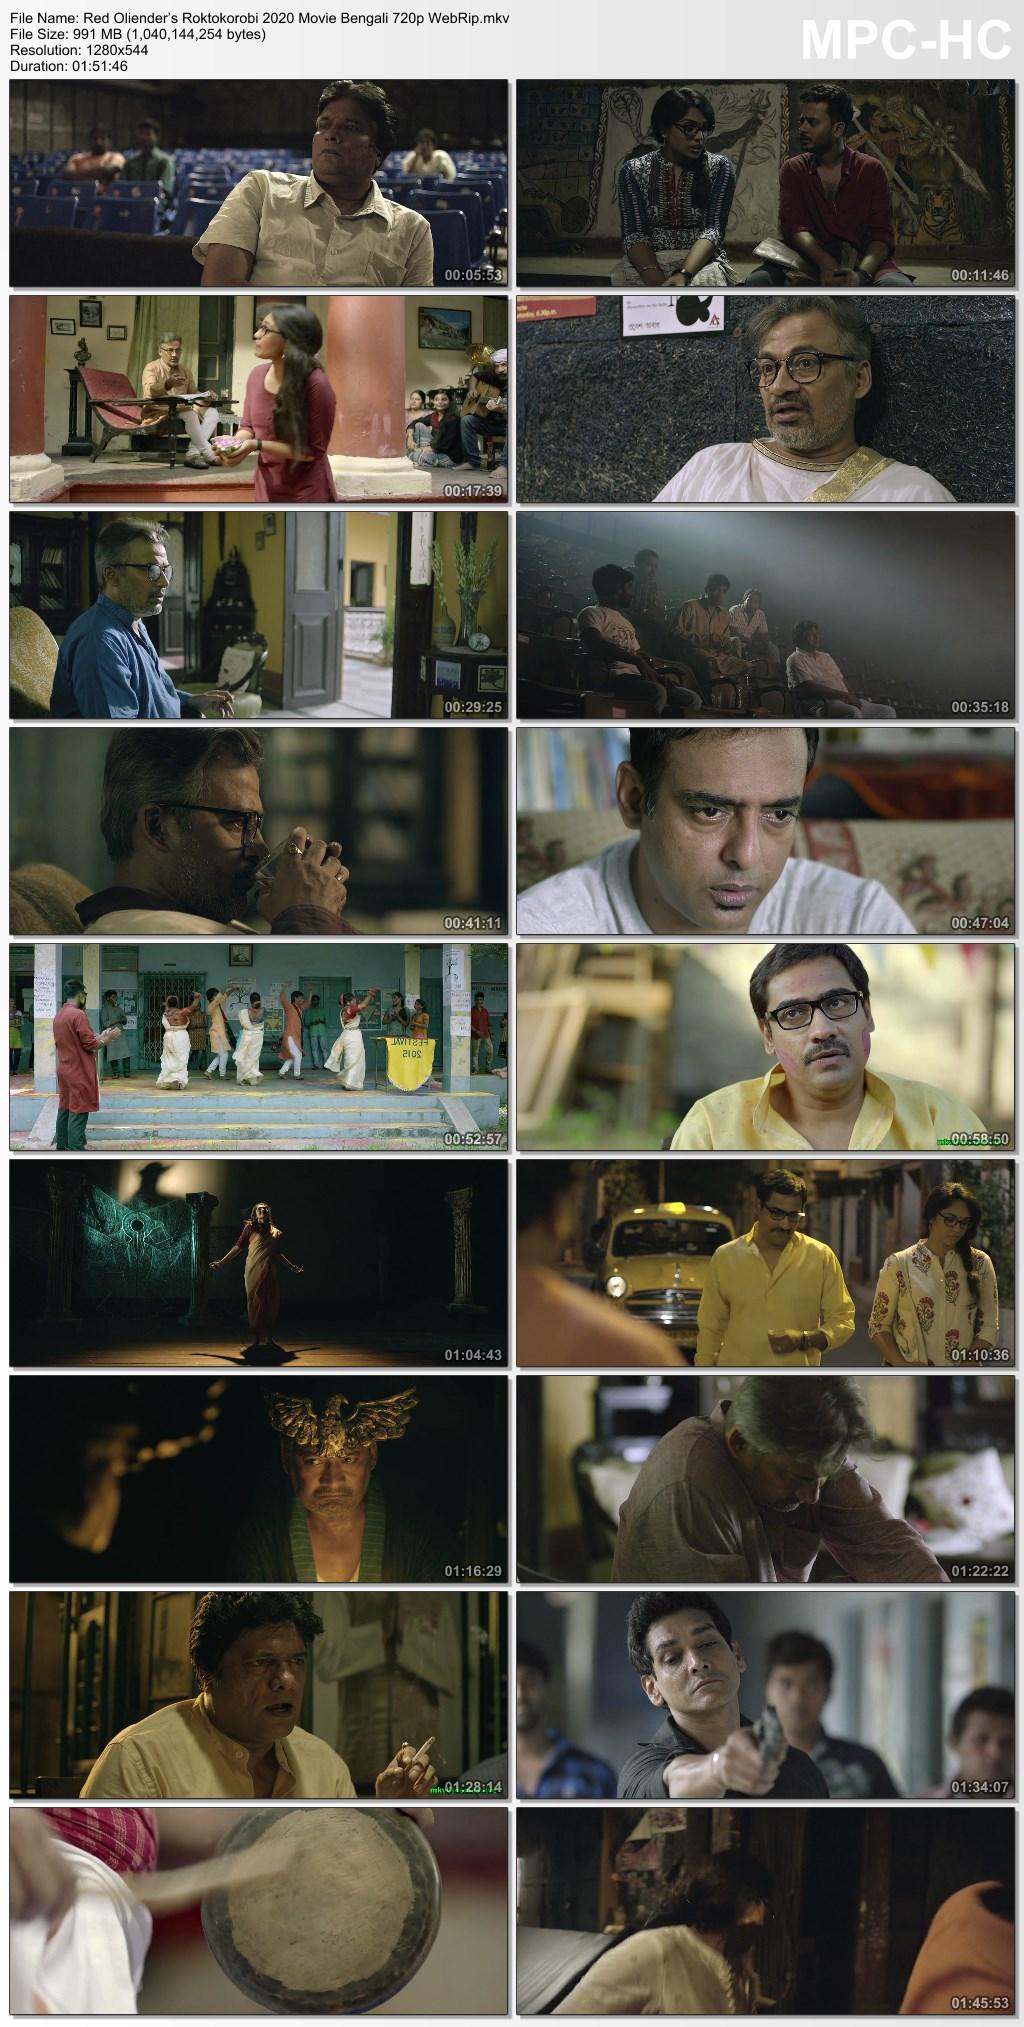 Red Oliender's Roktokorobi 2020 Movie Bengali 720p WebRip.mkv thumbs [2020.06.05 06.13.23]